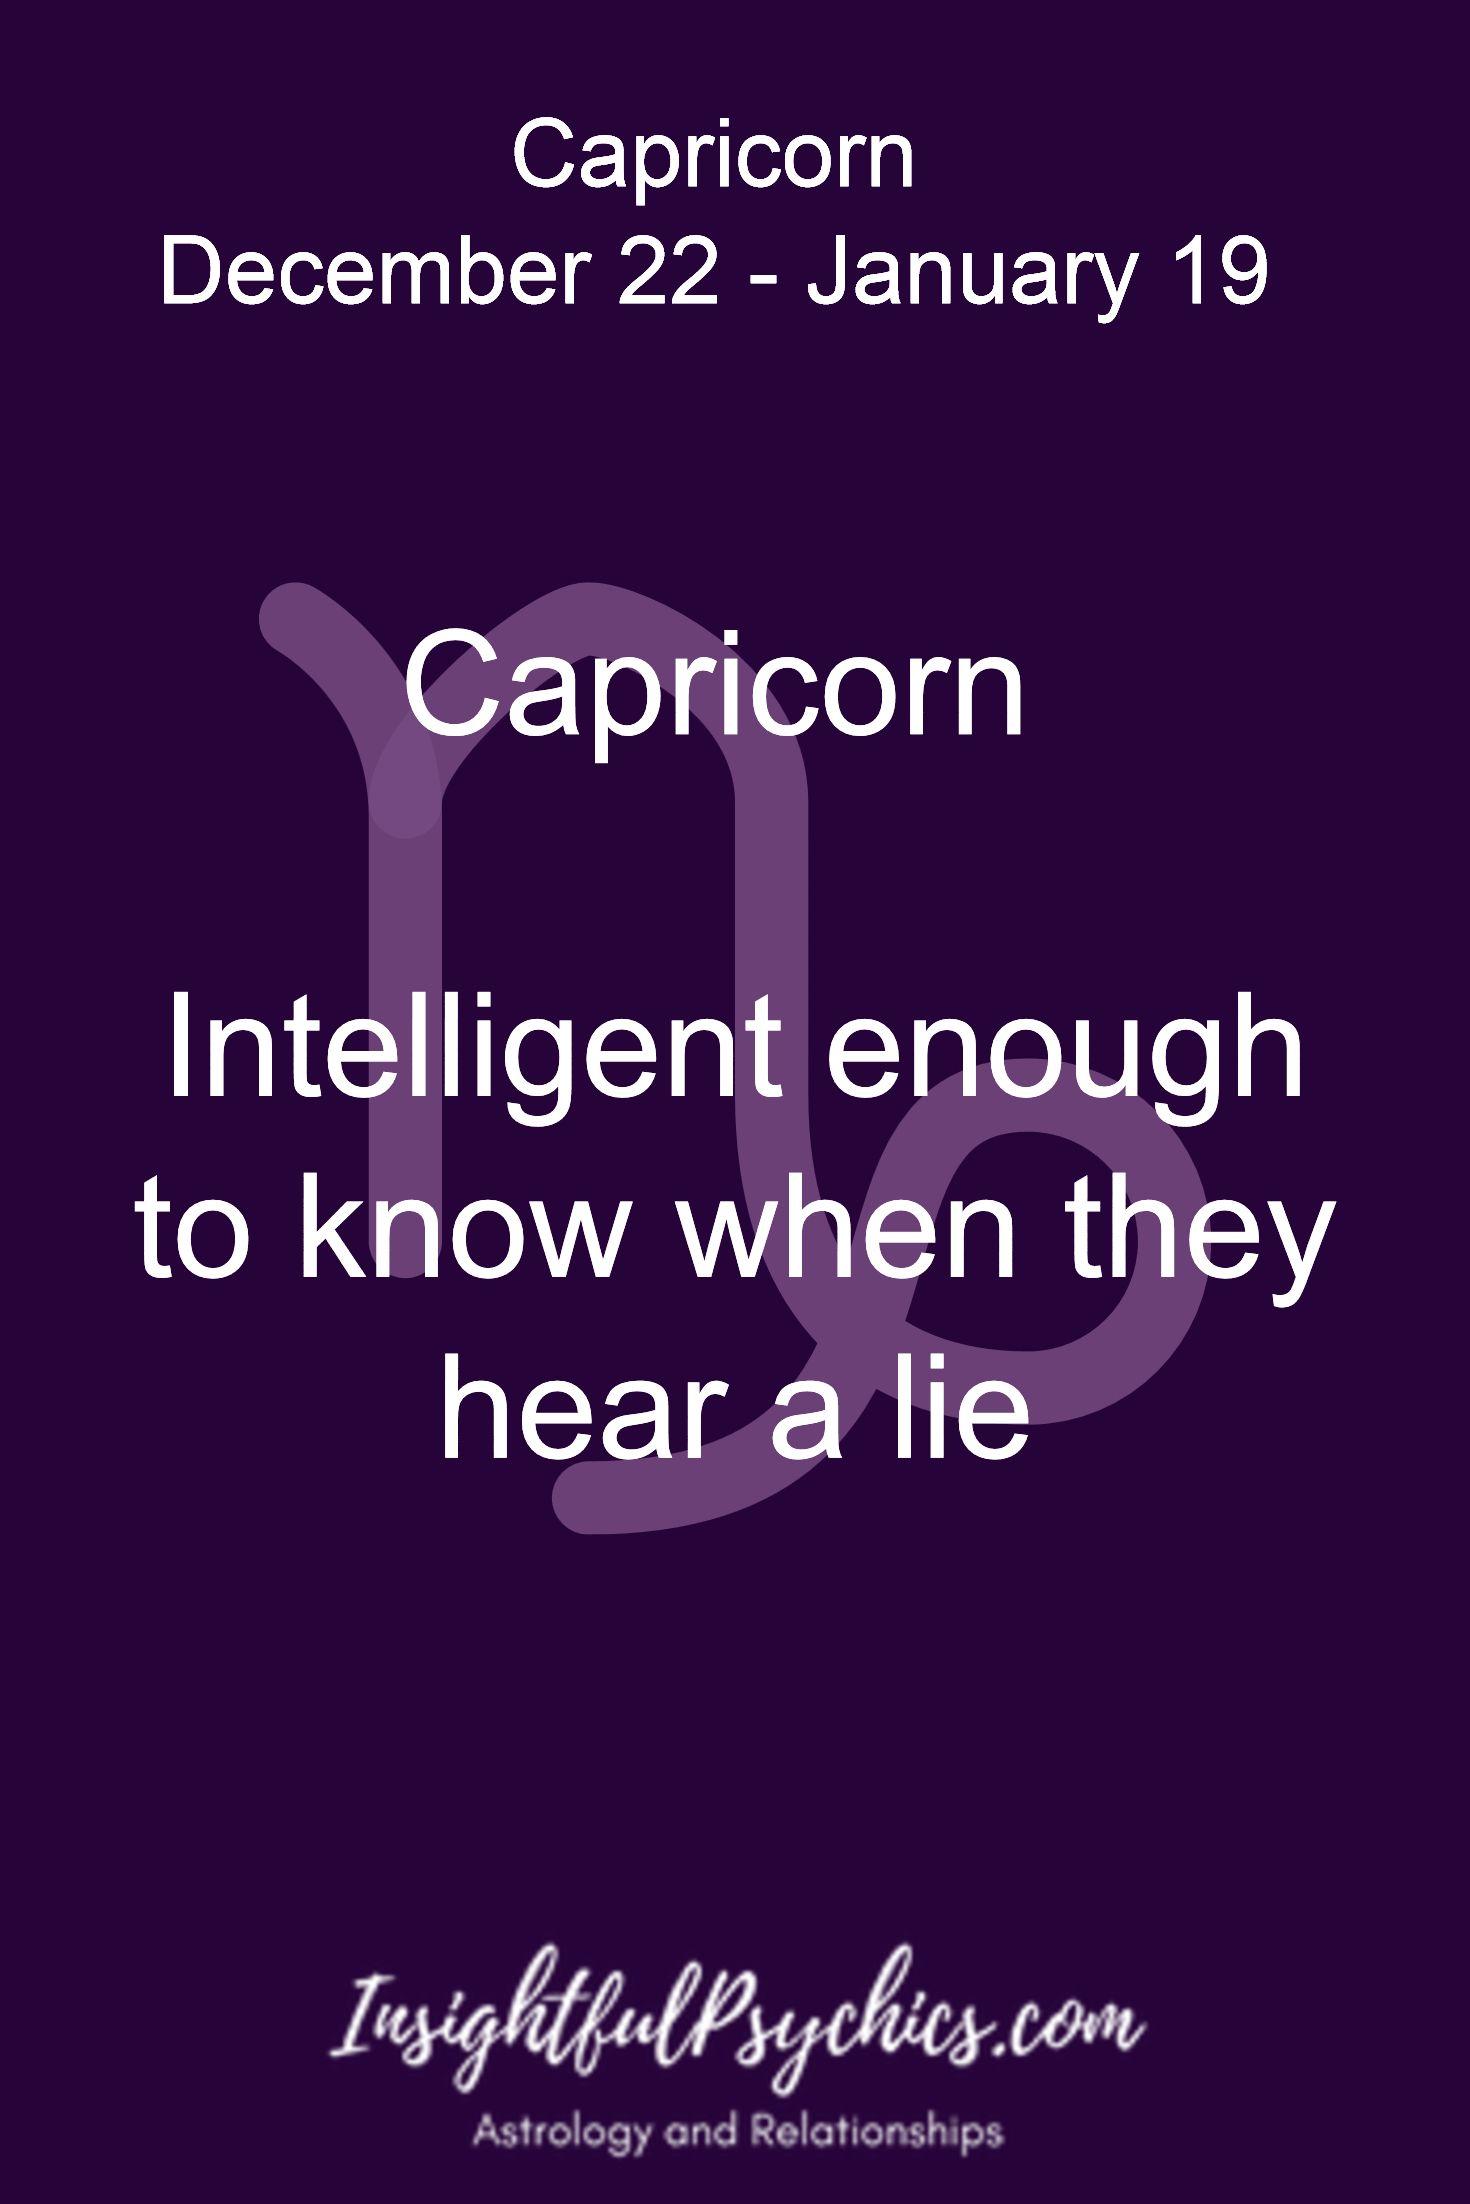 Capricorn Sign Dates, Traits, & More   Capricorn sign, Capricorn ...